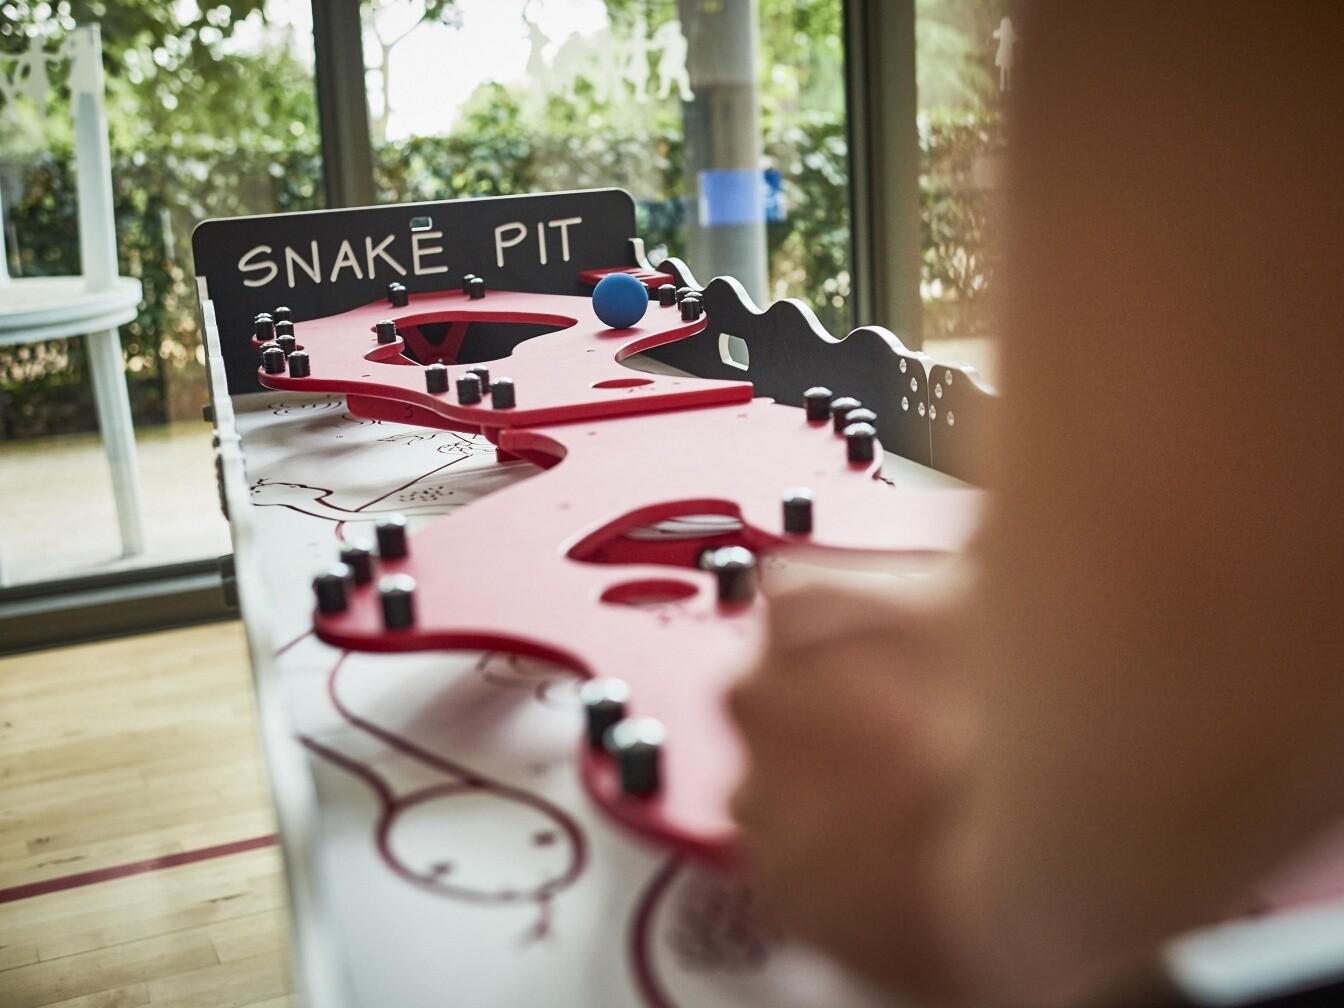 Snake Pit Nostalgic Games Hire London